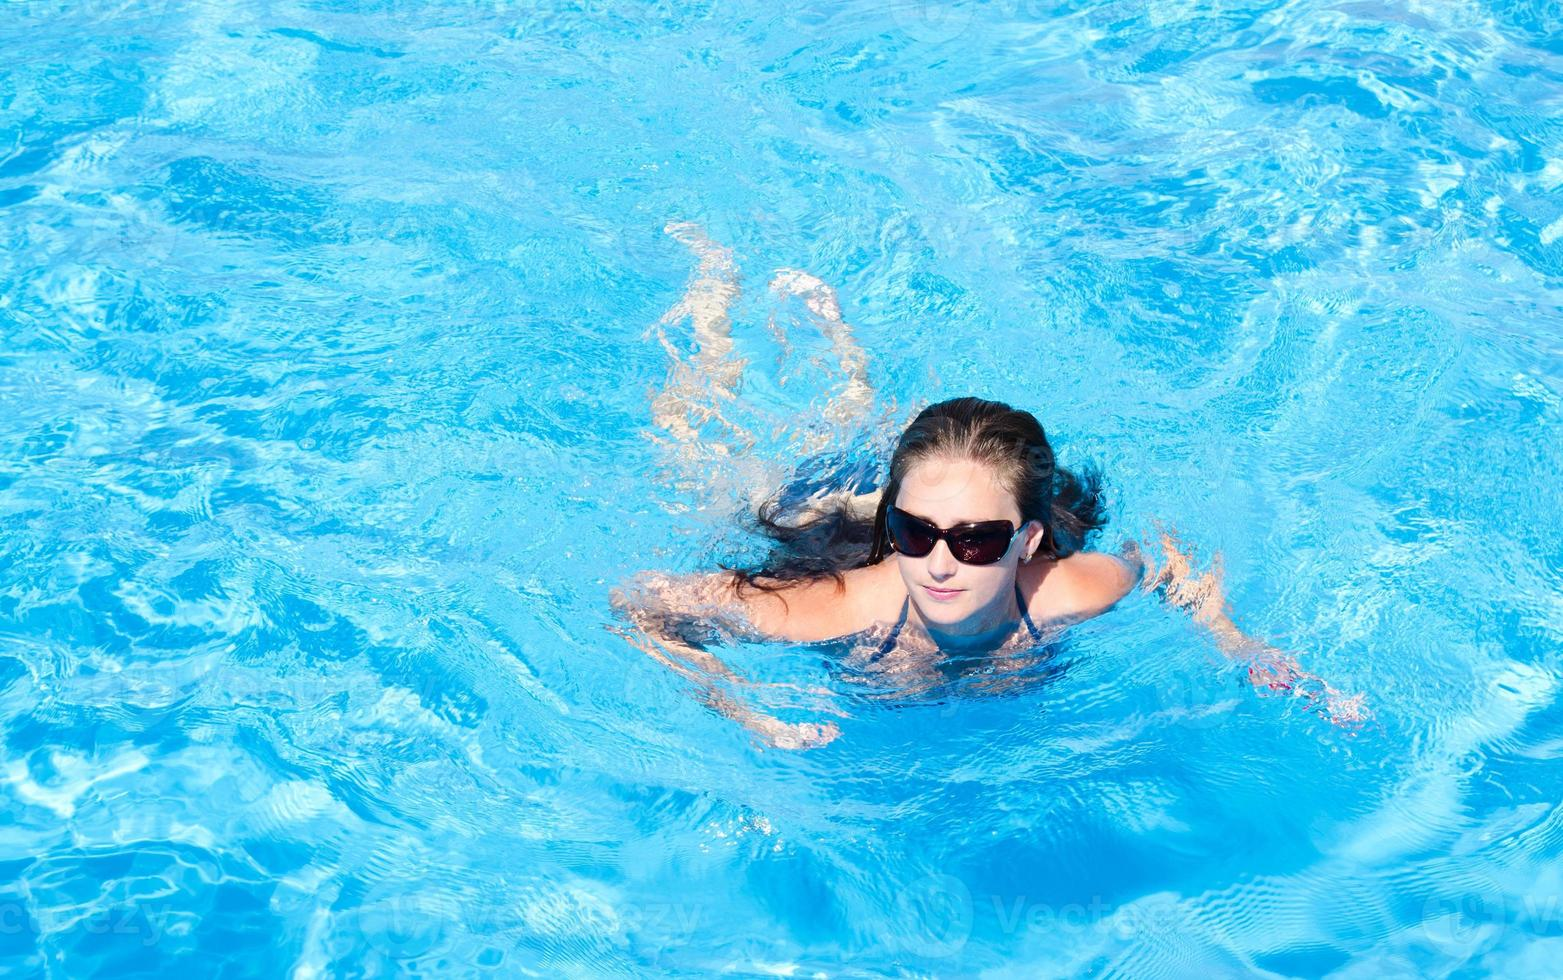 jong meisje in het zwembad foto